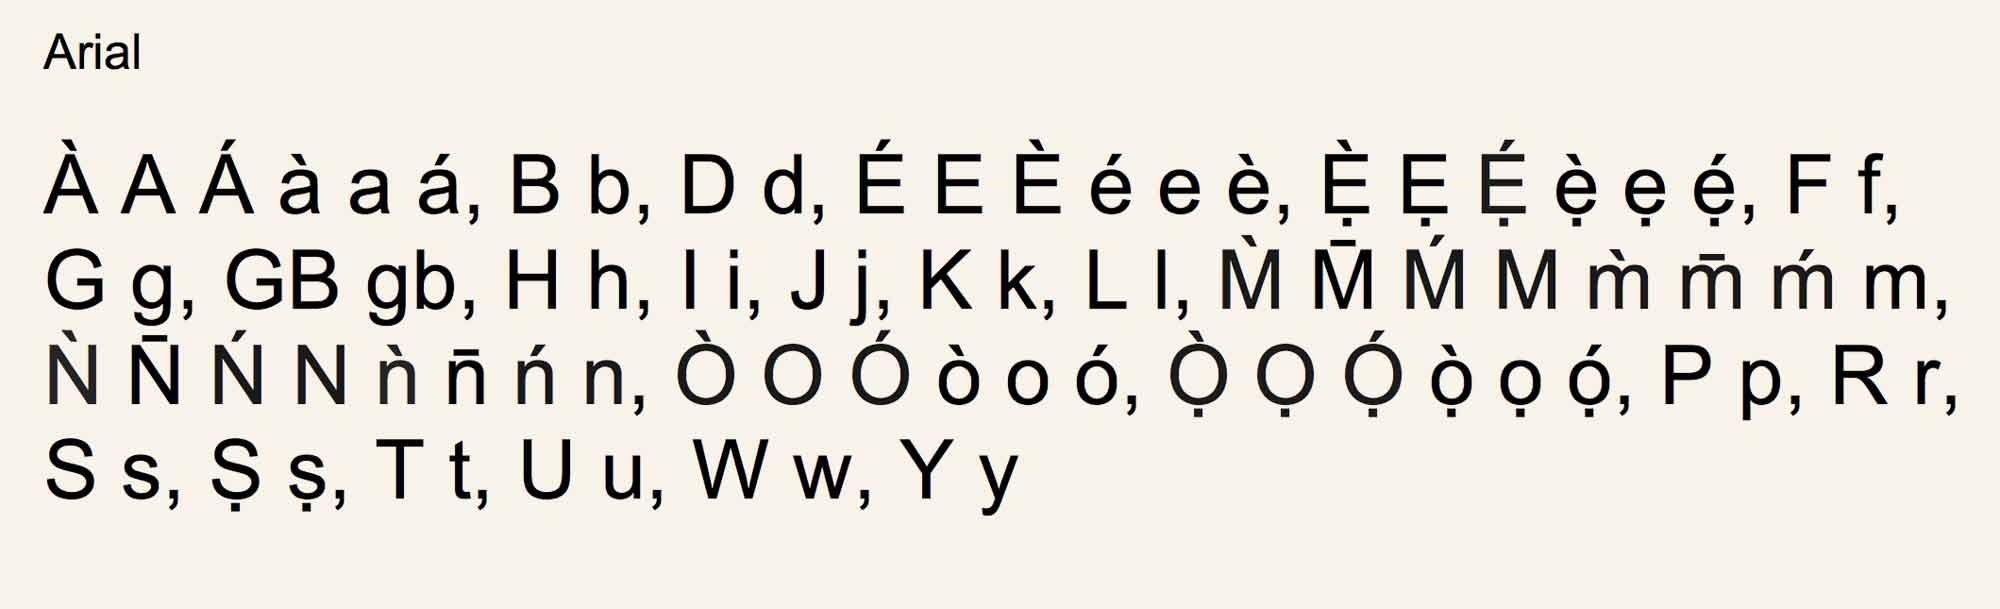 These are all characters you need to write Yorùbá!©Orisha Image